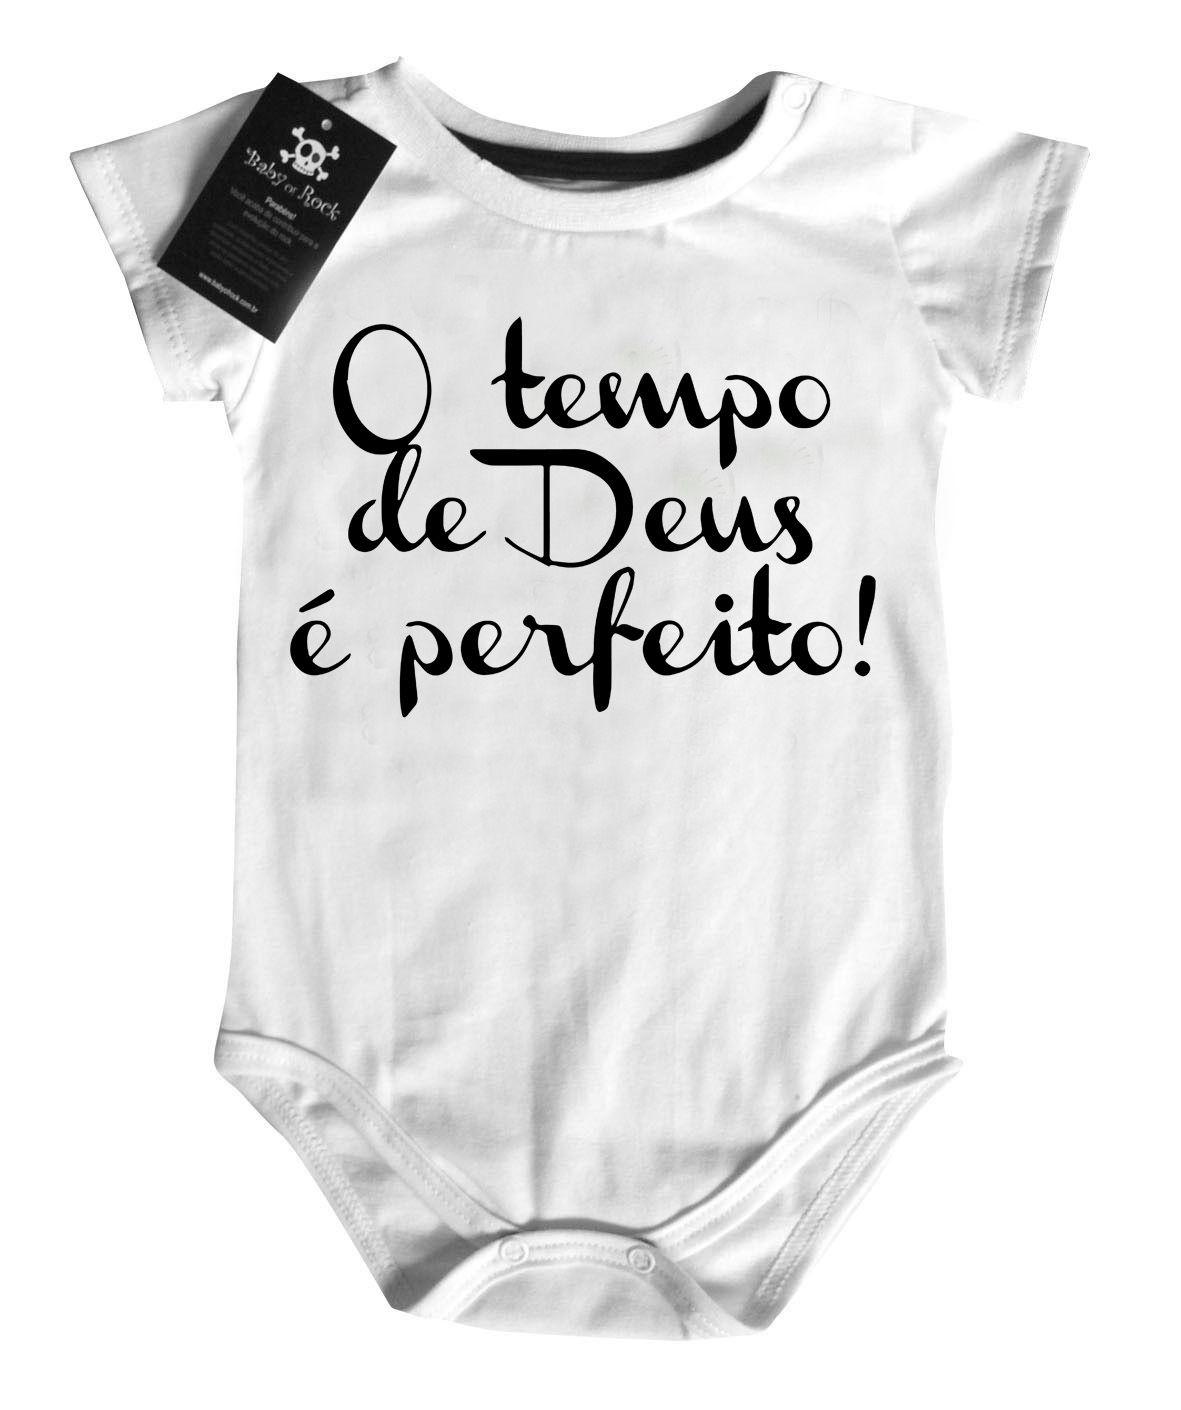 Body Gospel Tempo de Deus - White  - Baby Monster - Body Bebe